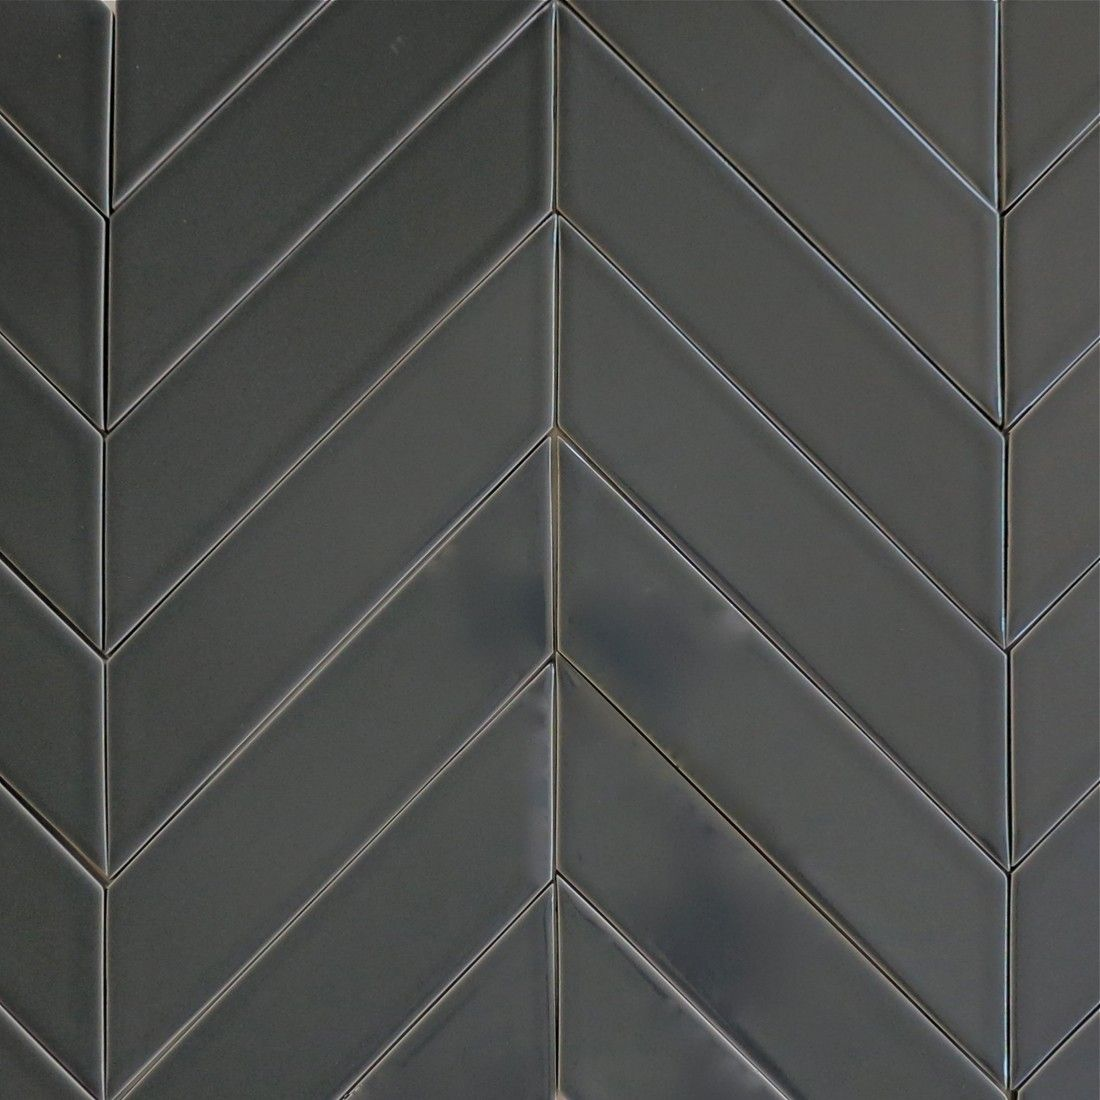 Boston Glass Wall Tiles